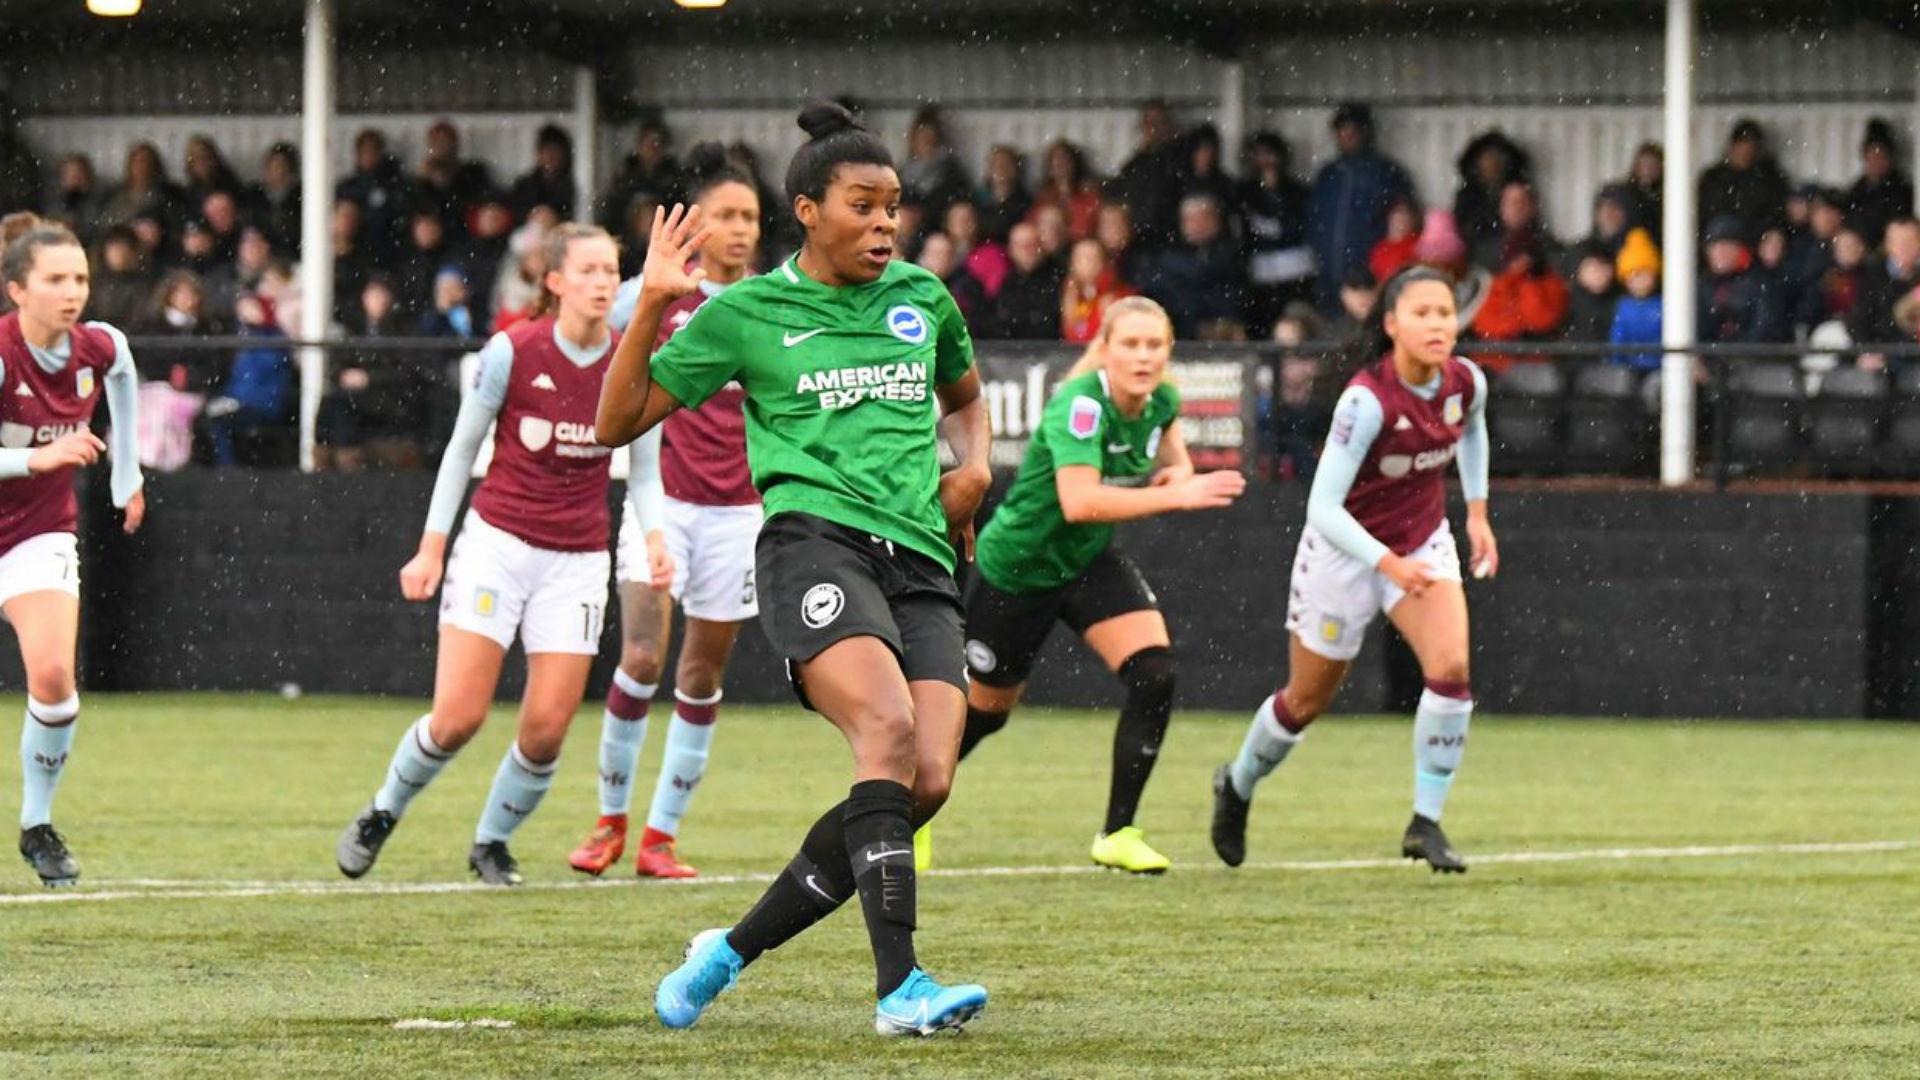 Nigeria striker Umotong leads Brighton past Aston Villa in Women's FA Cup